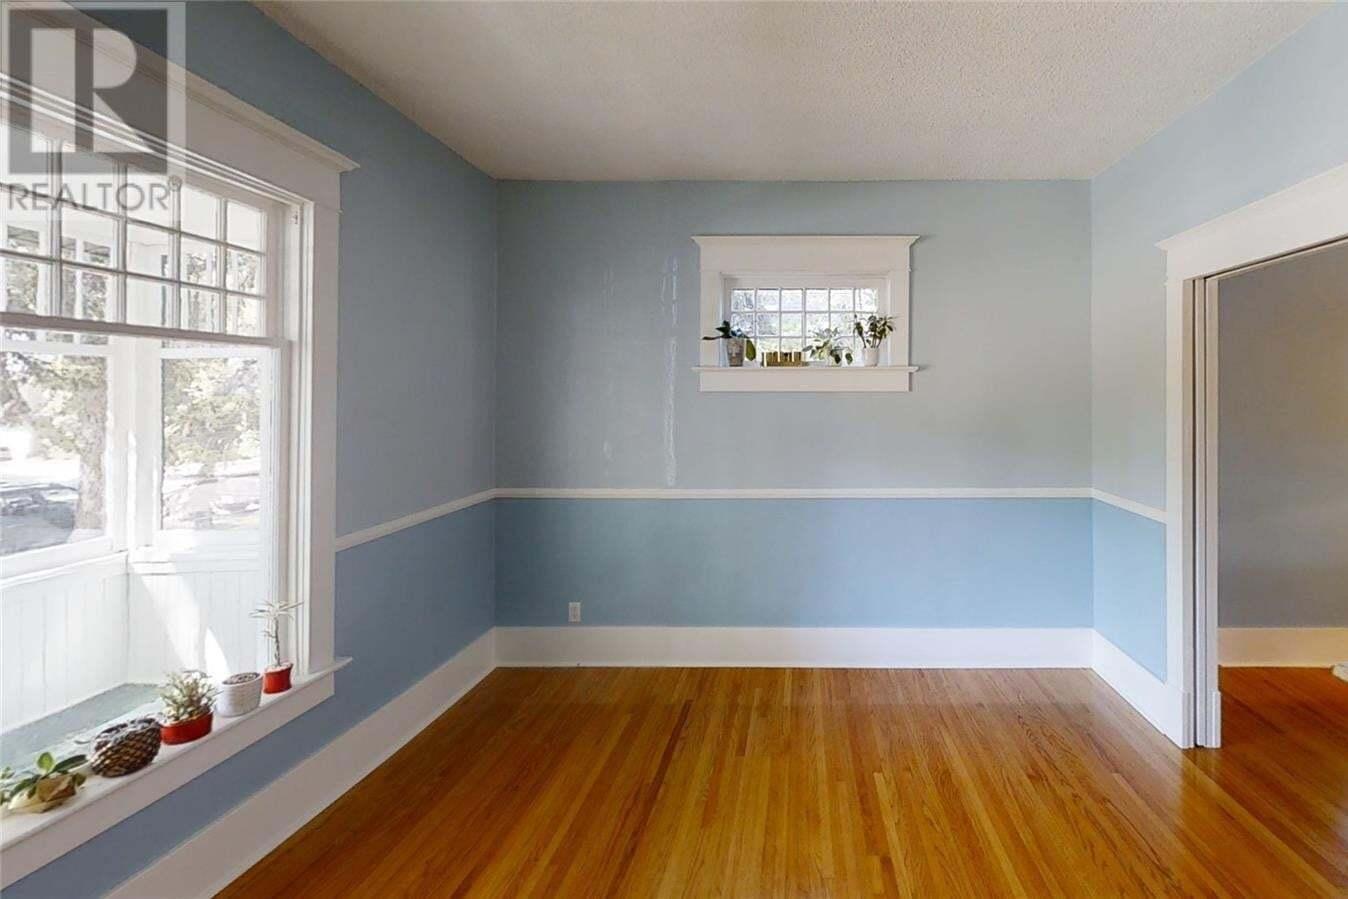 House for sale at 817 15th St E Saskatoon Saskatchewan - MLS: SK810578